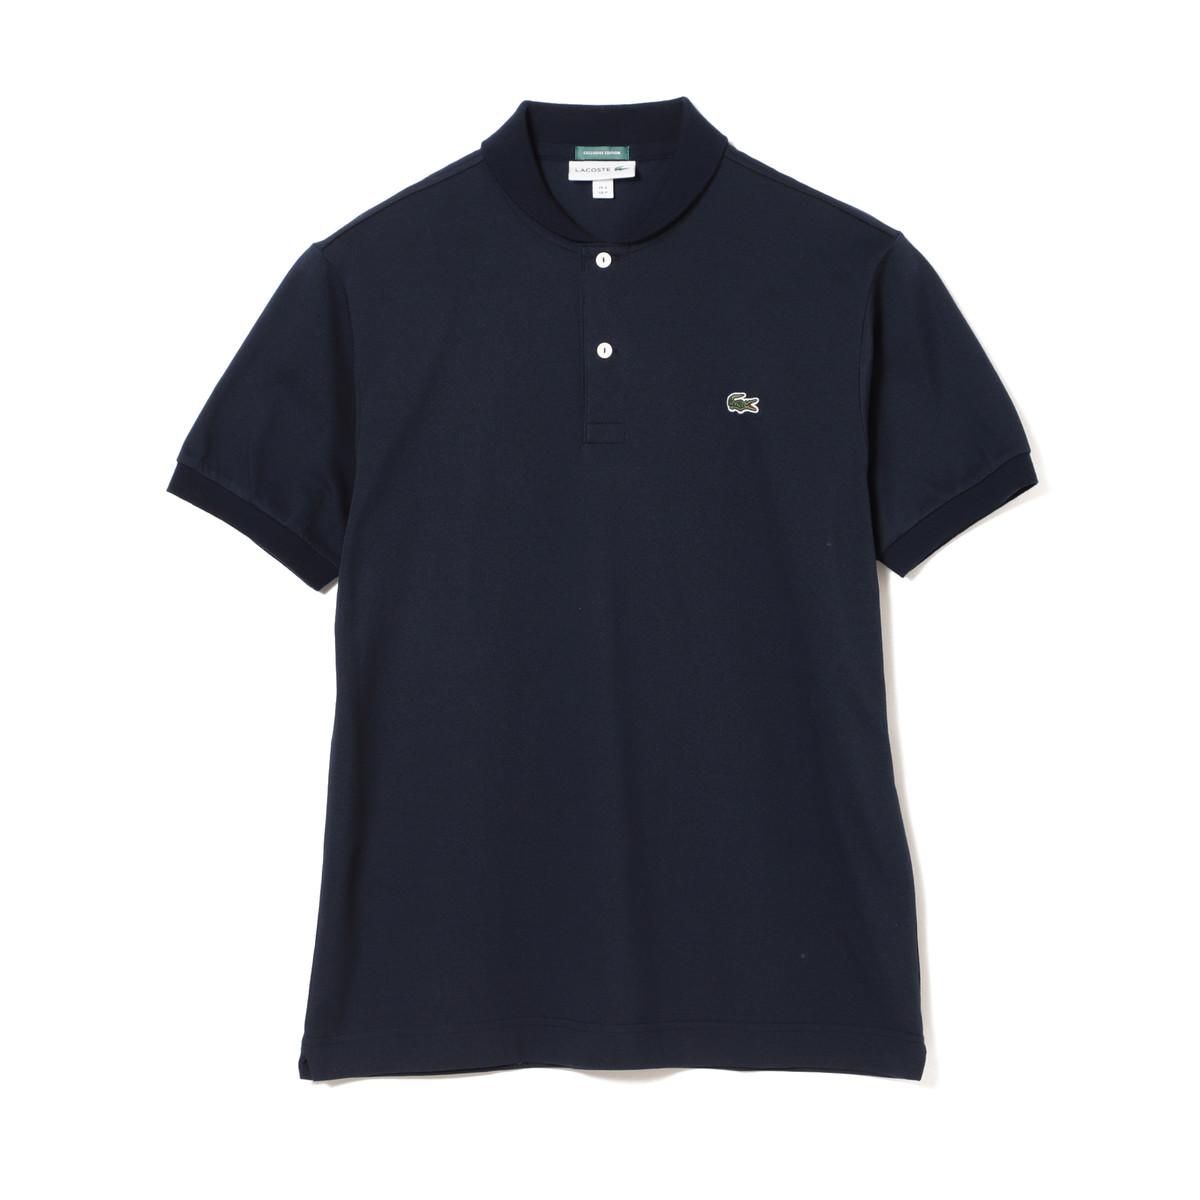 LACOSTE×BEAMS GOLF 別注 ショールカラー ポロシャツ